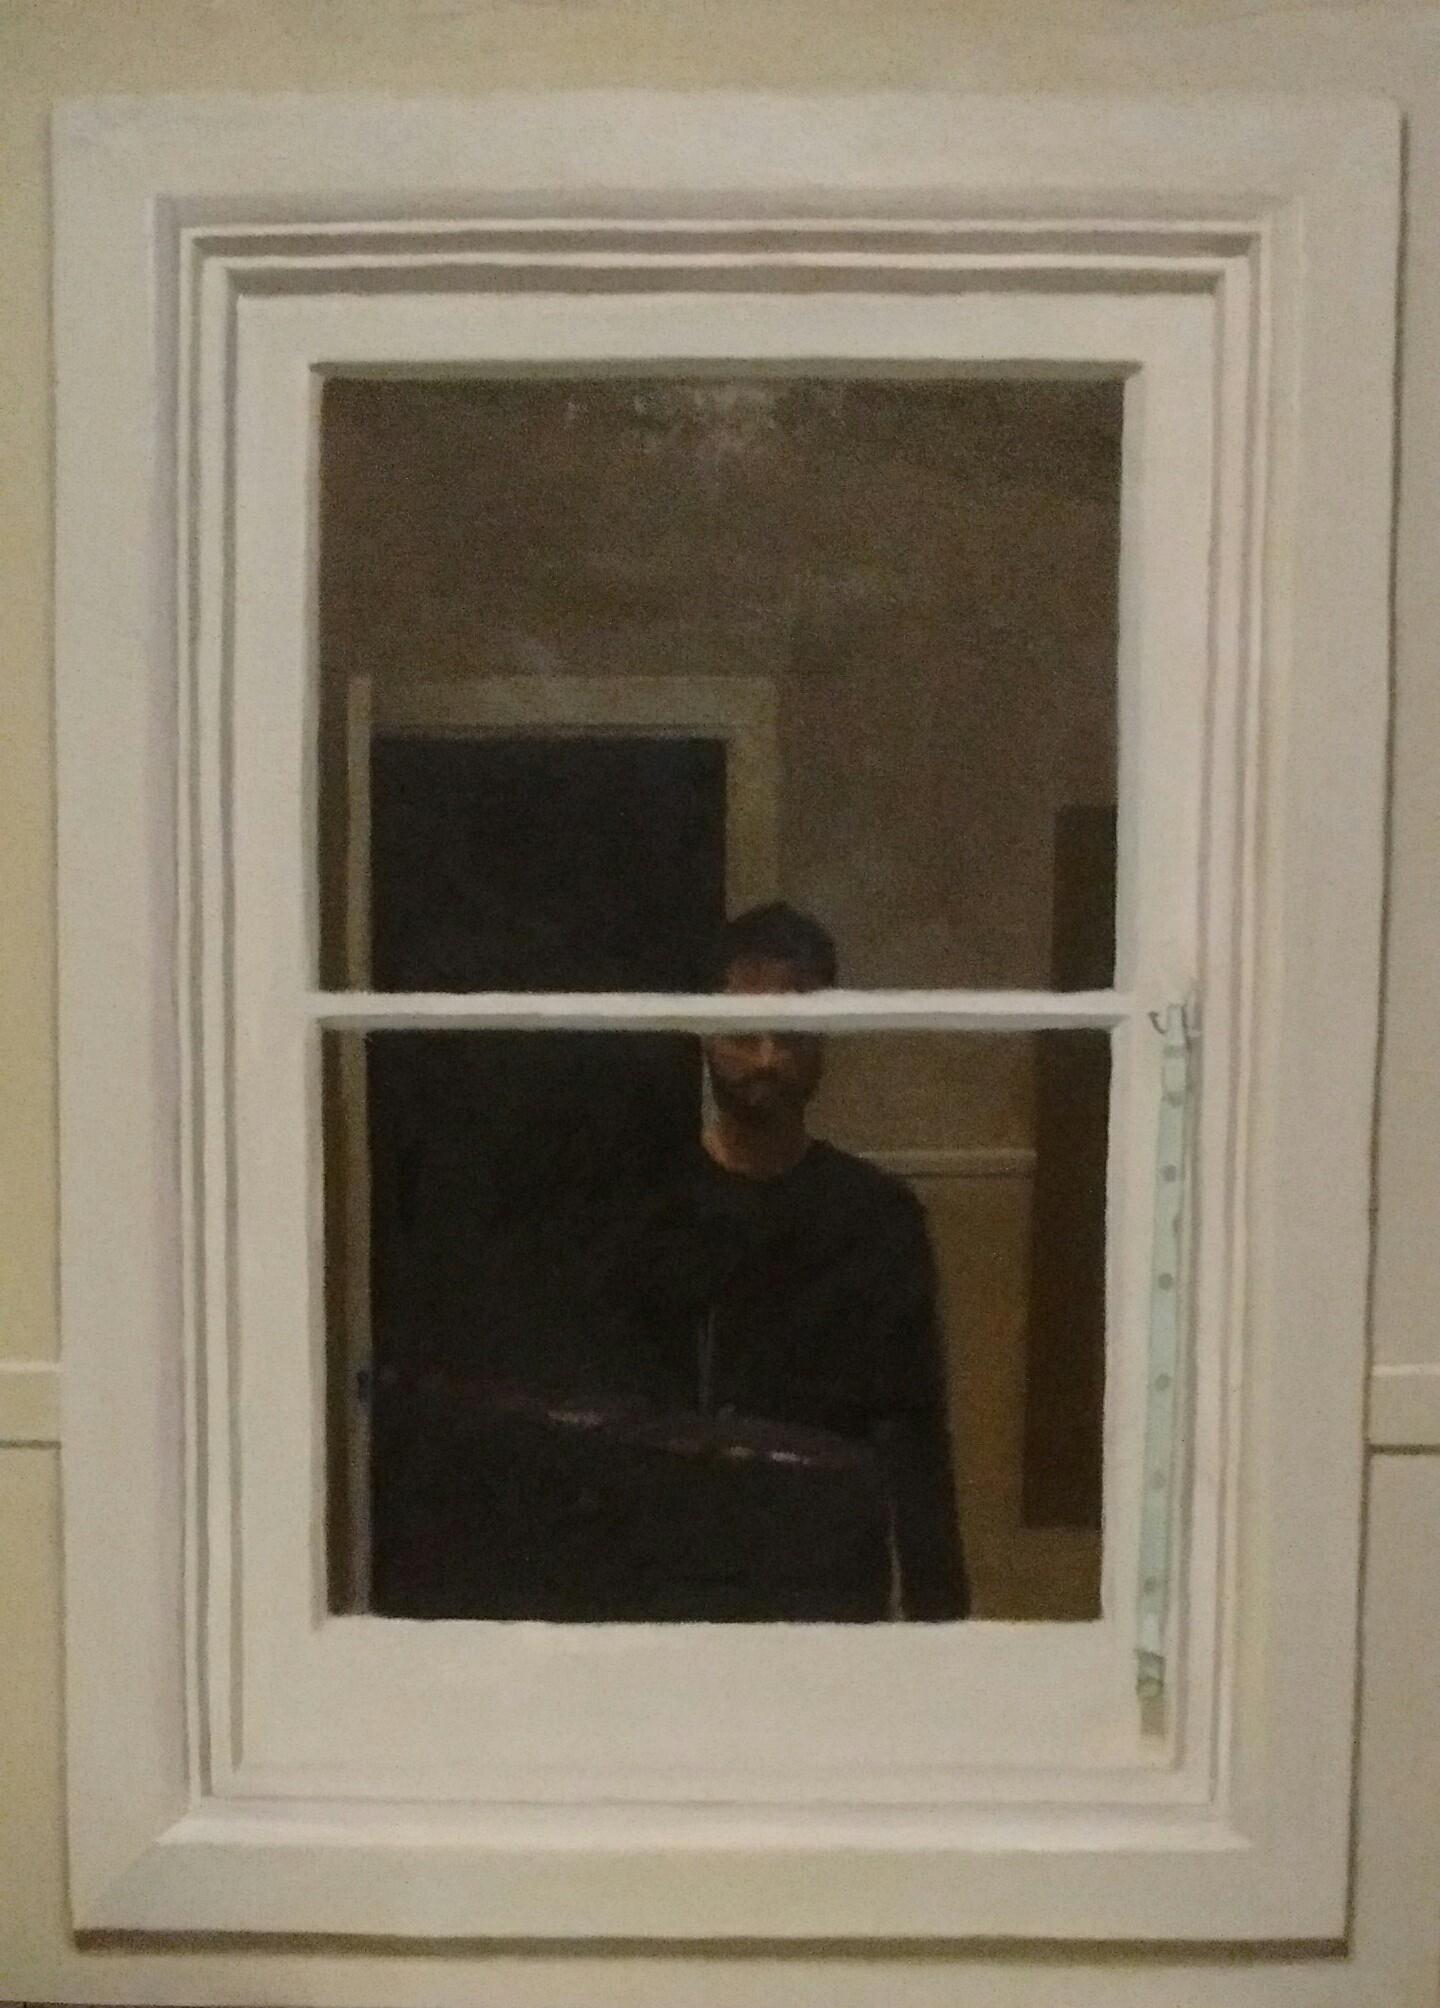 Reflection in Studio Window